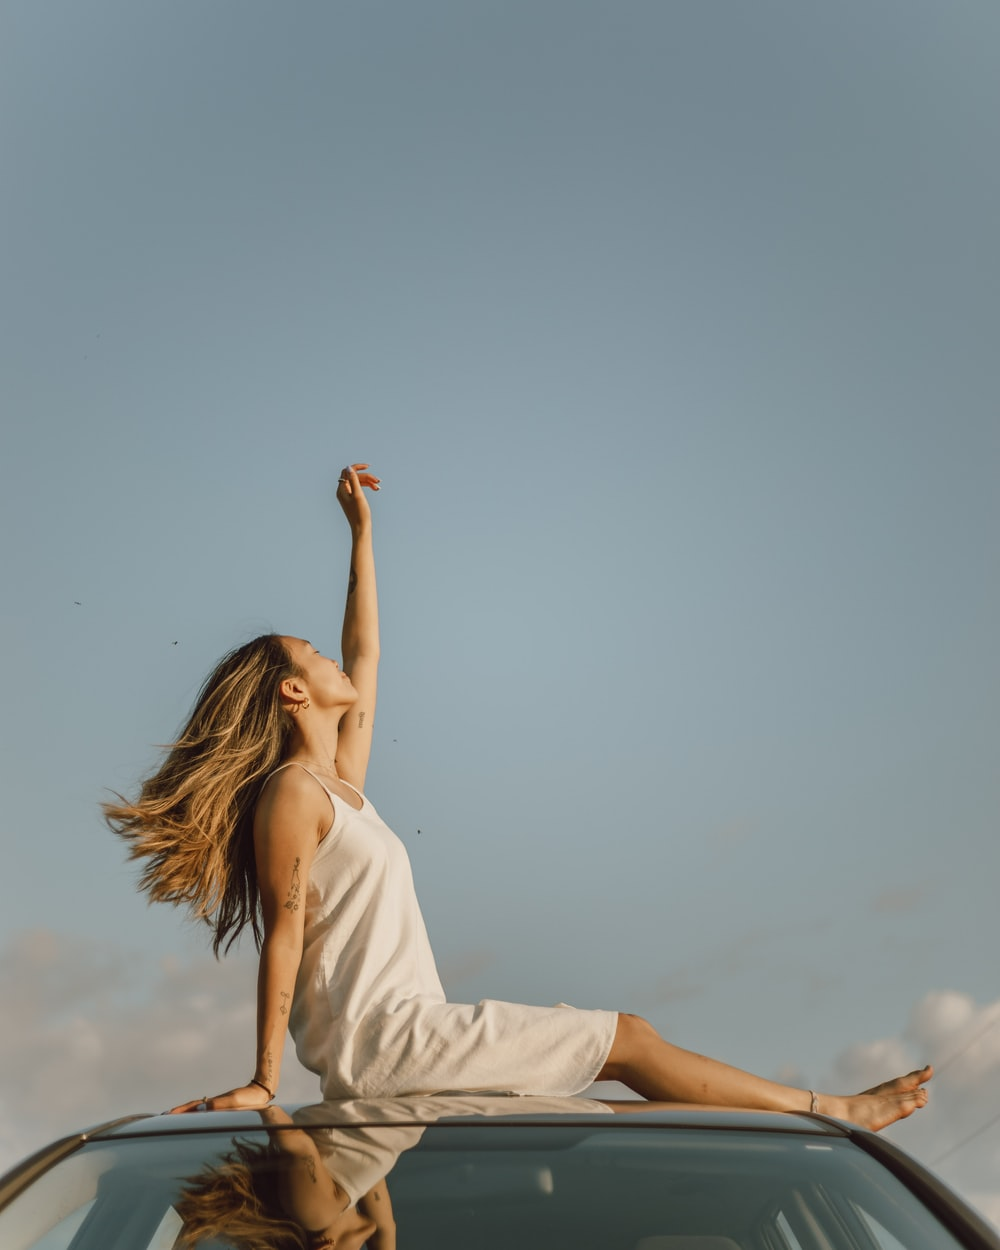 woman in white sleeveless dress raising her right hand